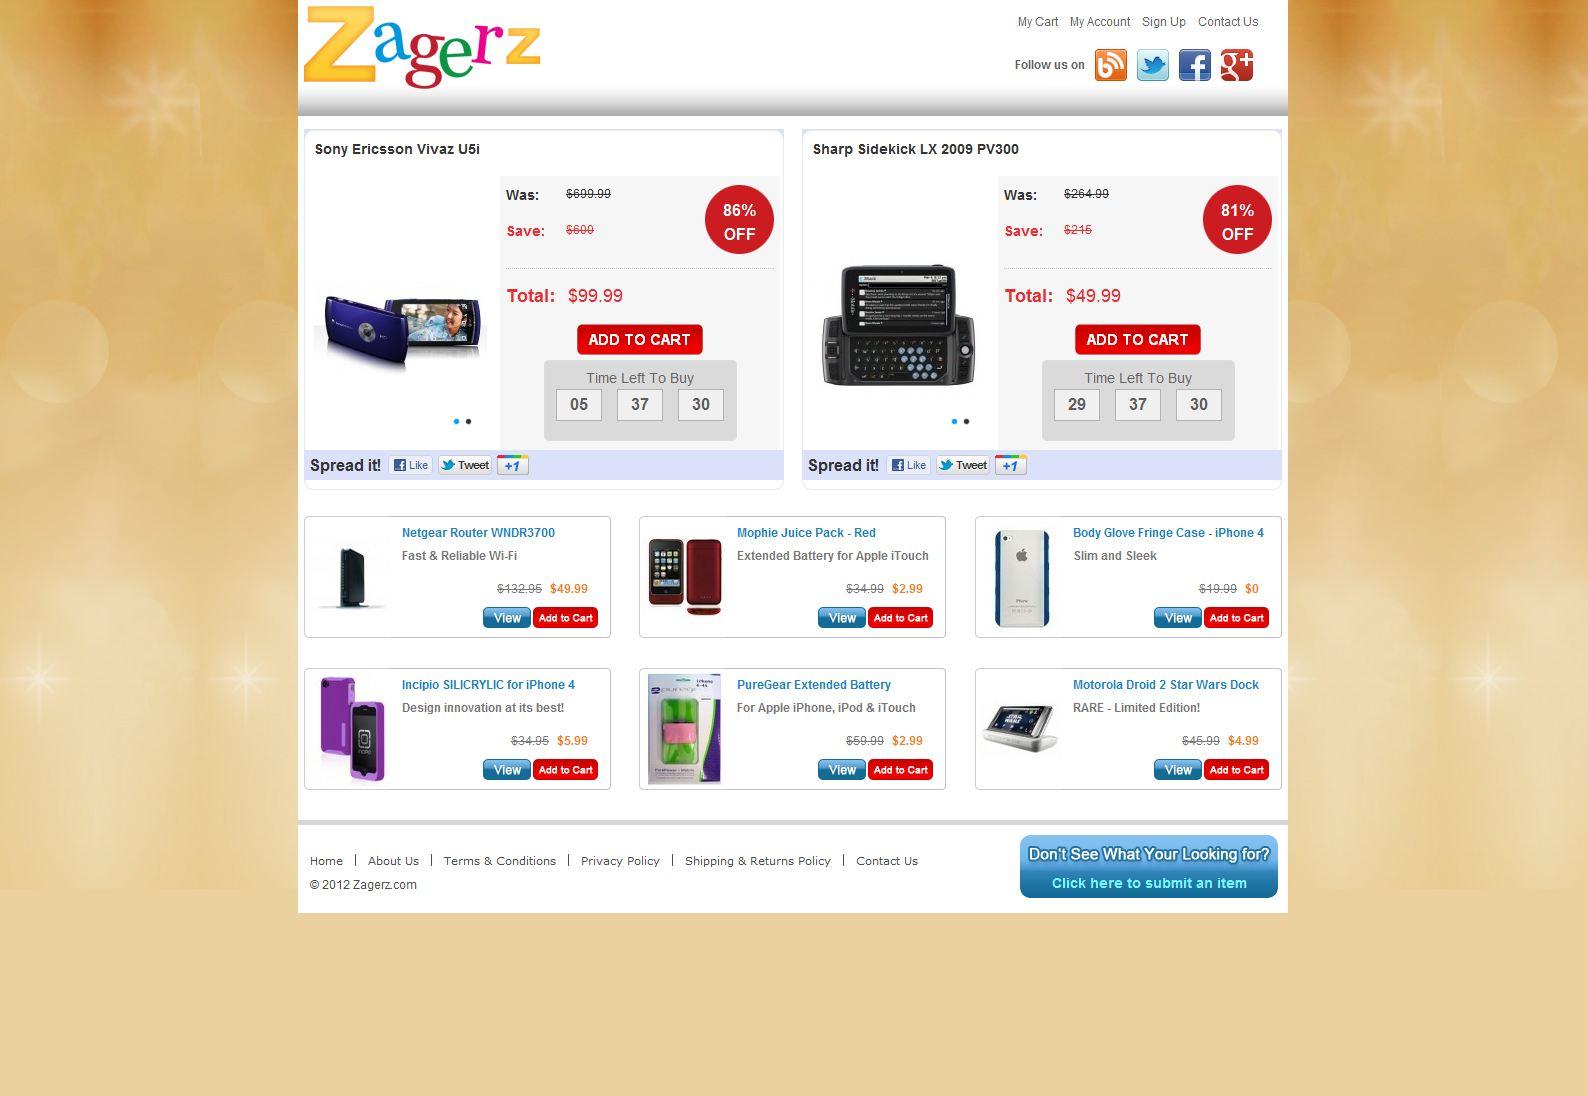 Zagerz.com